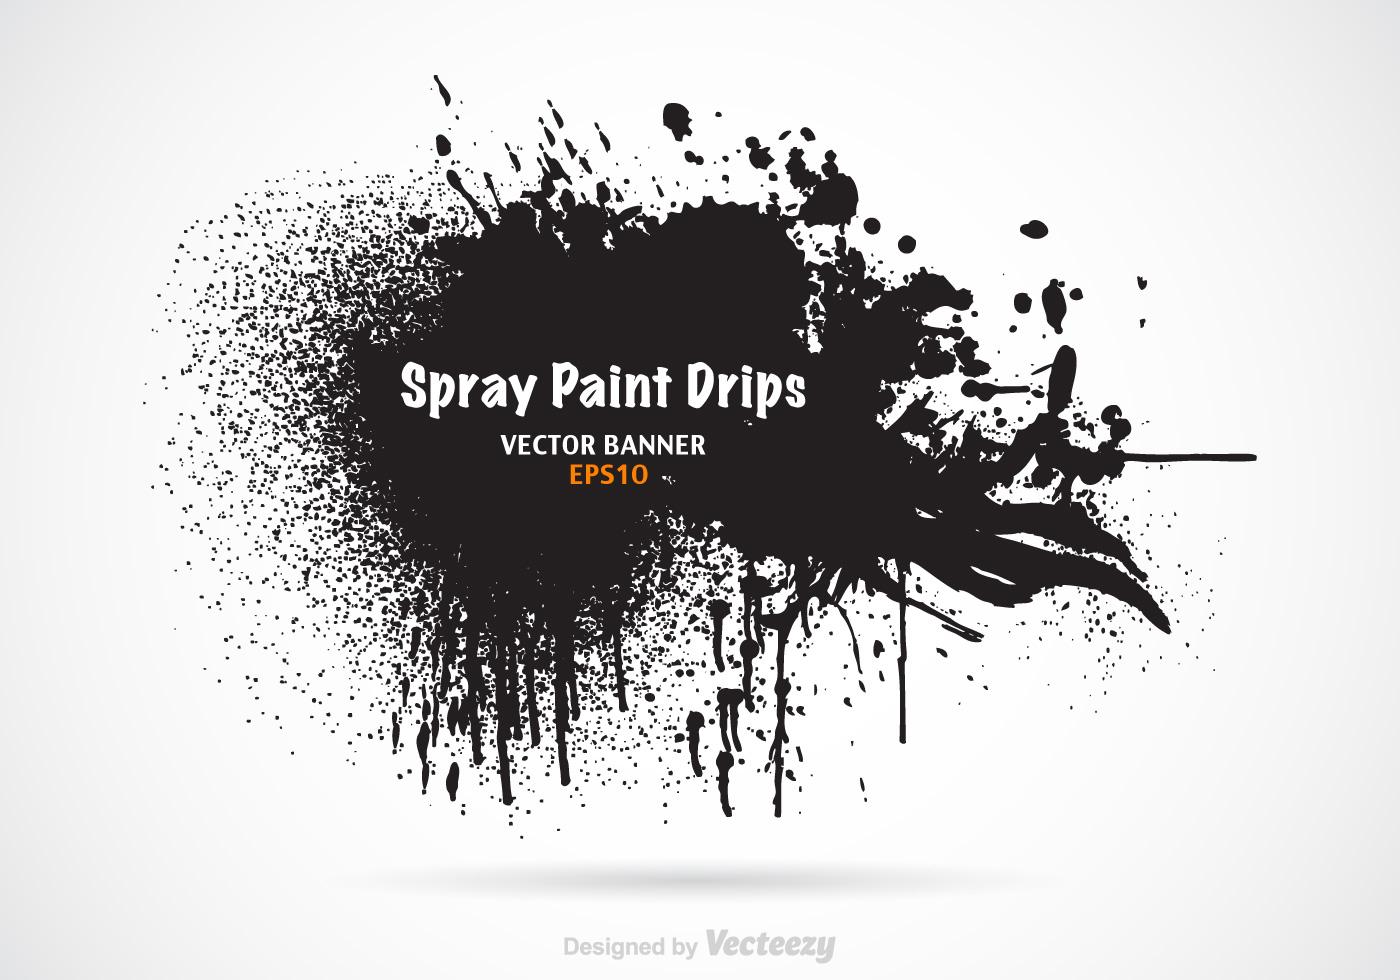 spray paint drips vector banner